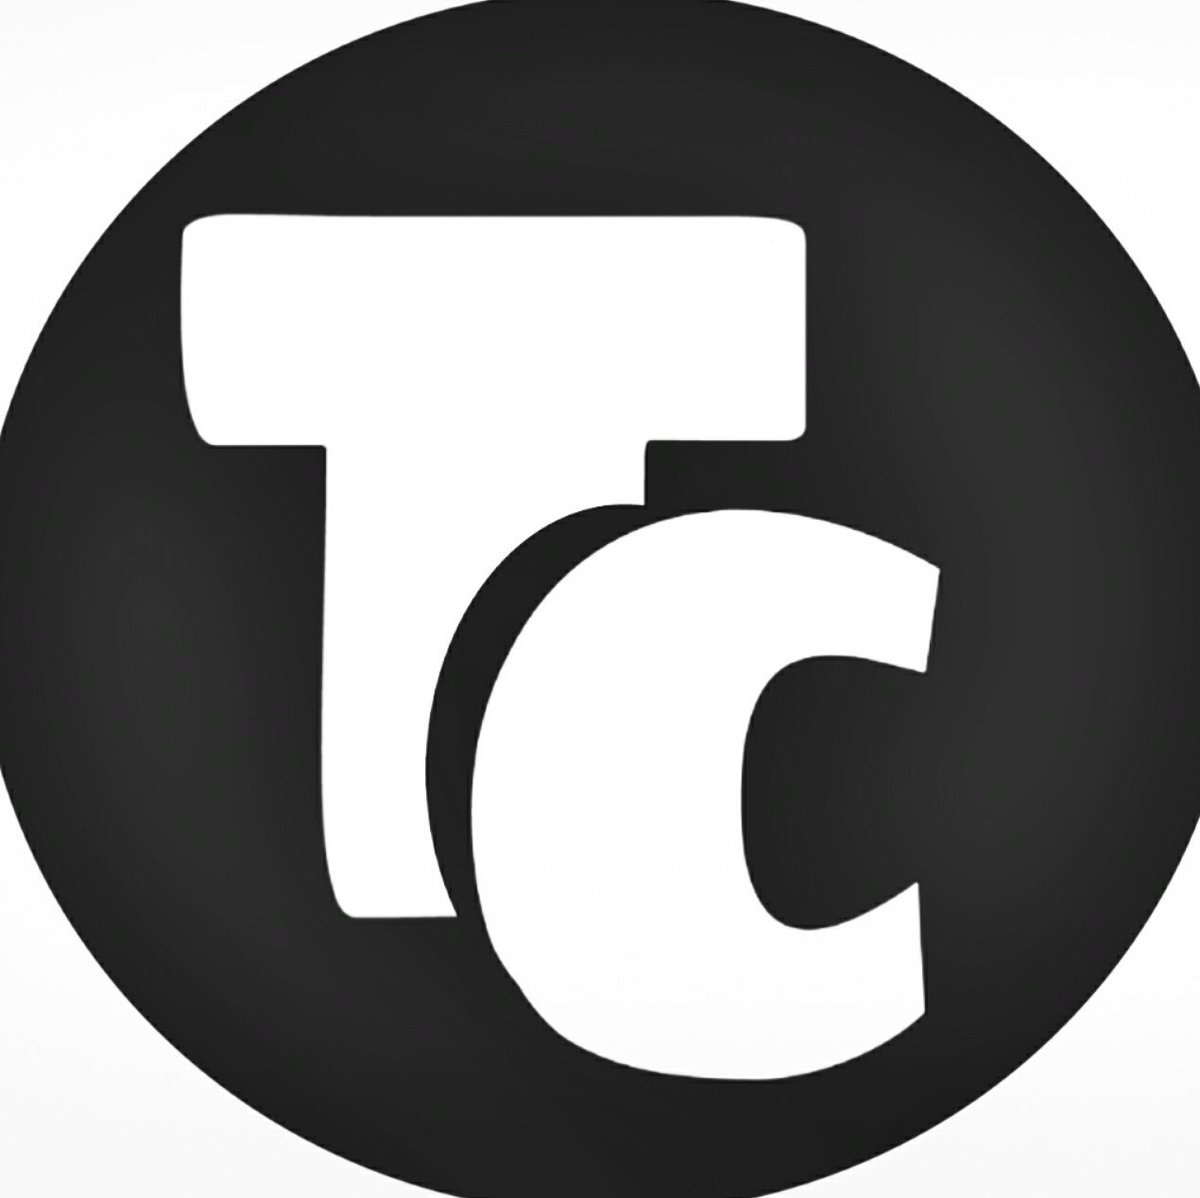 New #logo ❤️ #techcookies #youtube #youtuber #youtubechannel #youtubevideos #tech #technology @YTCreatorsIndia @YouTubeIndia #logos #logo_design #logodesigns #logodesigner #creatorsummit